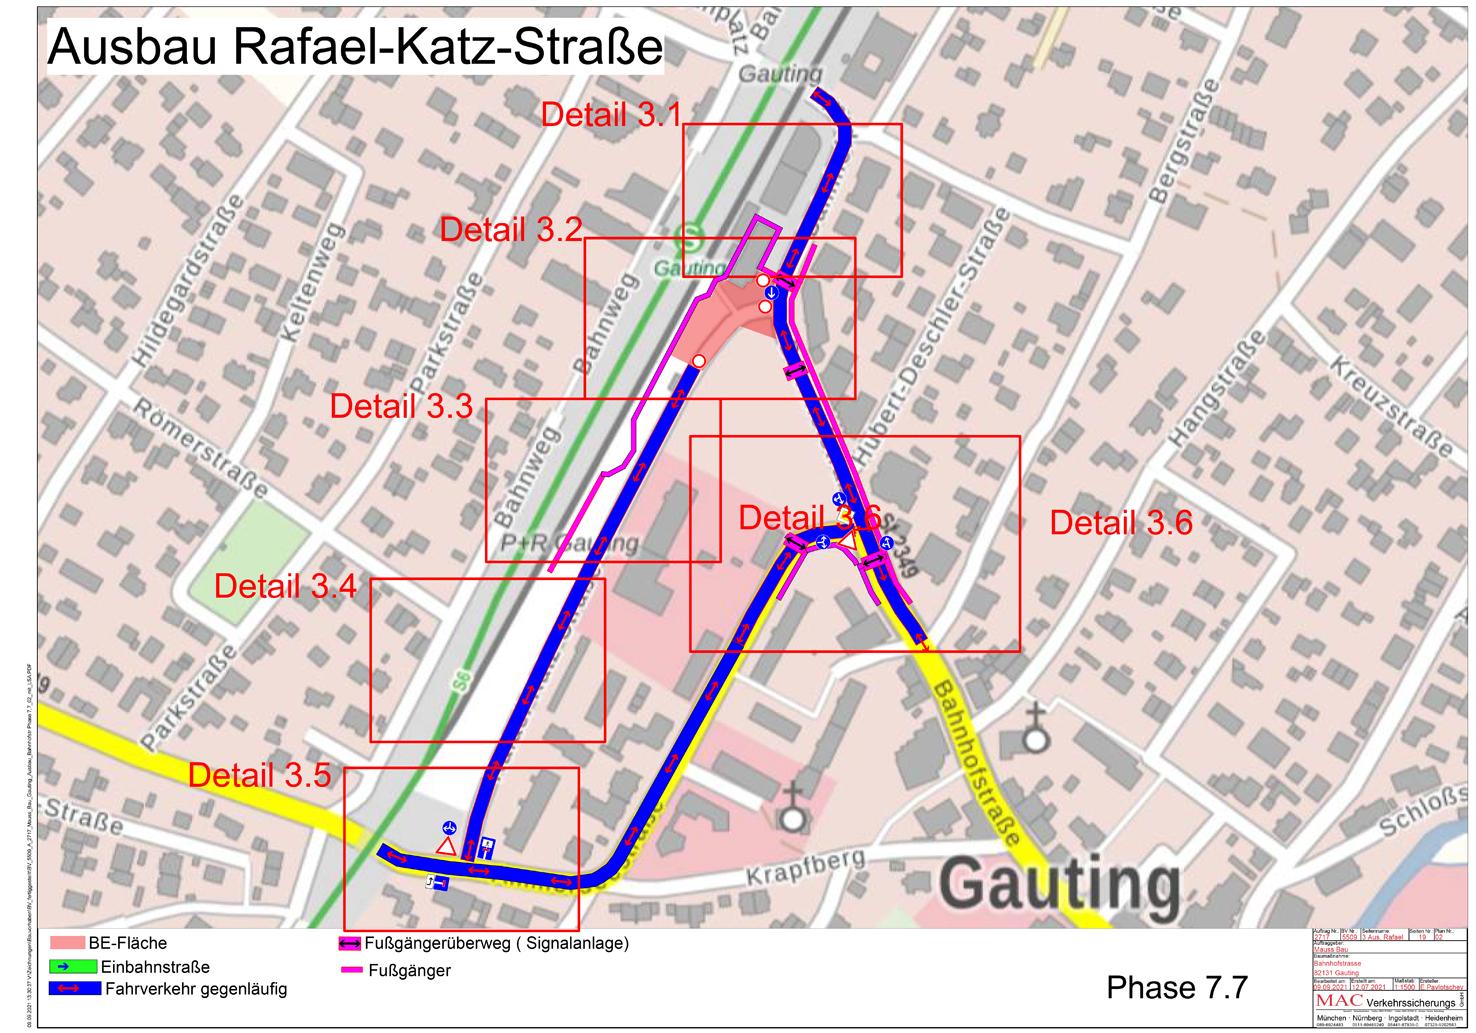 https://www.gauting.de/fileadmin/gauting-online/Dateien/bilder/Diverse_Zielseiten/Baustellen_im_Gemeindegebiet/BV_7.jpg